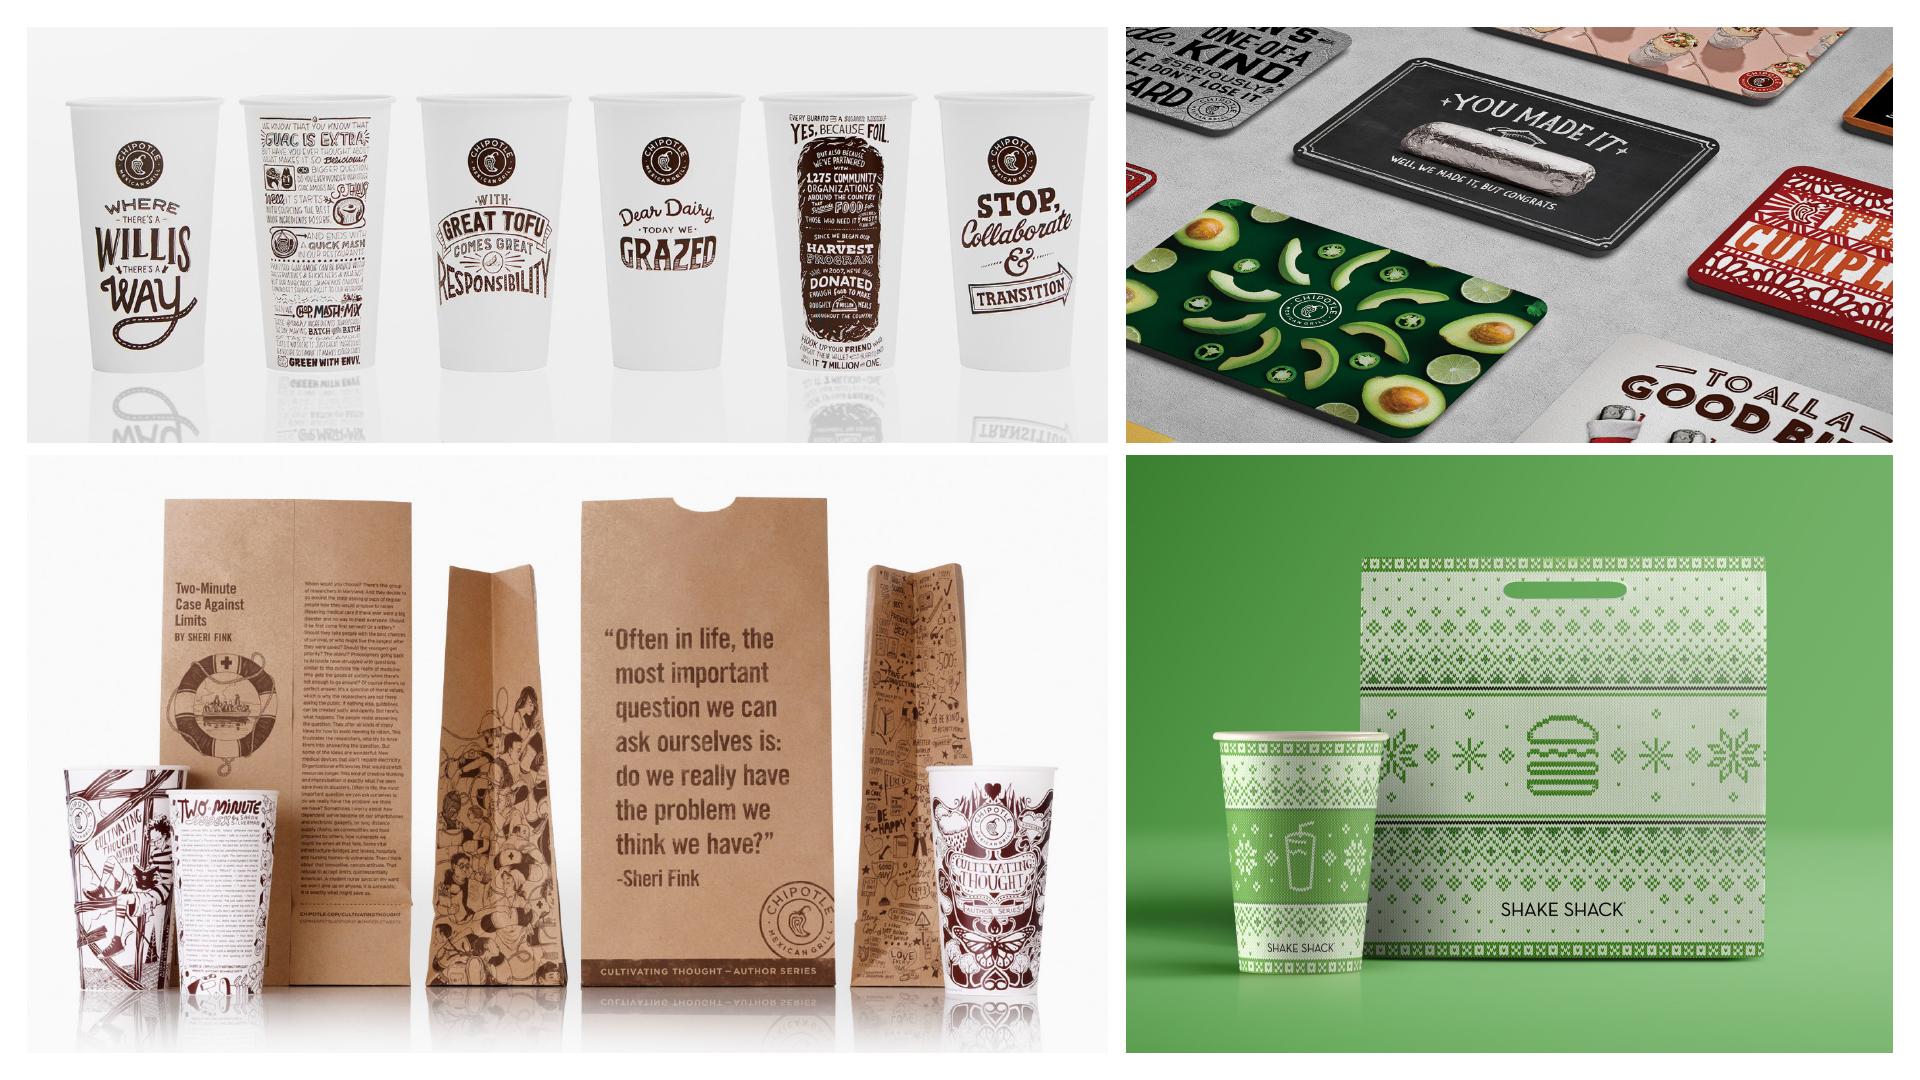 Jd&co. branding work